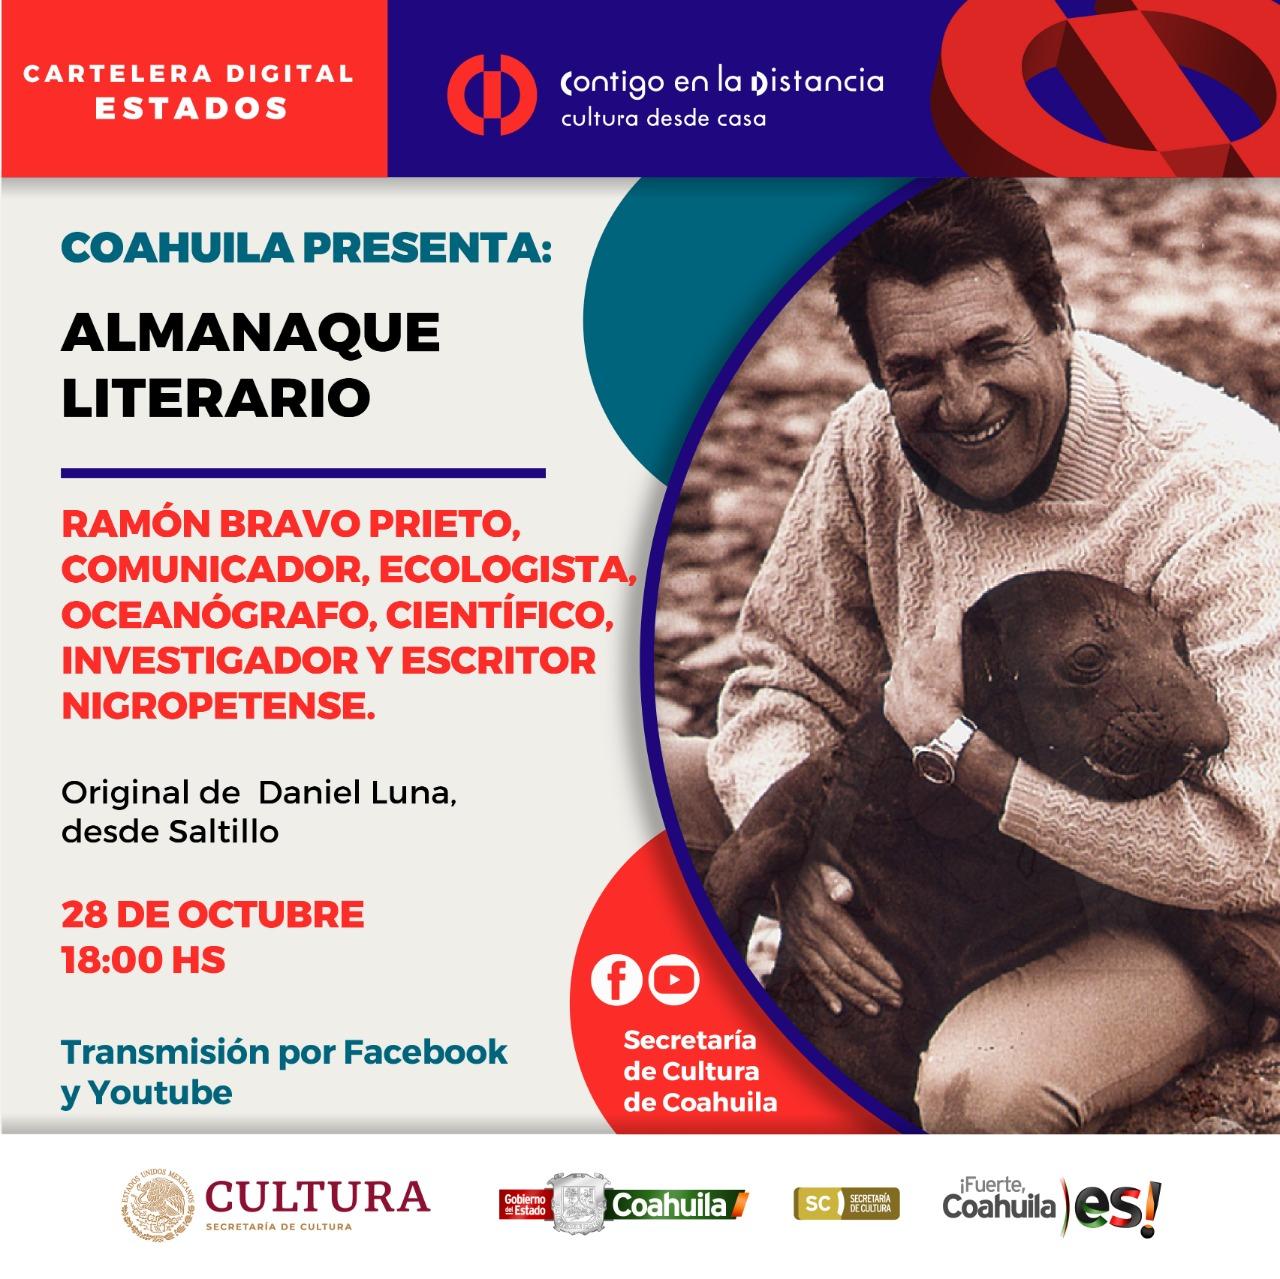 COAHUILA PRESENTA: ALMANAQUE LITERARIO